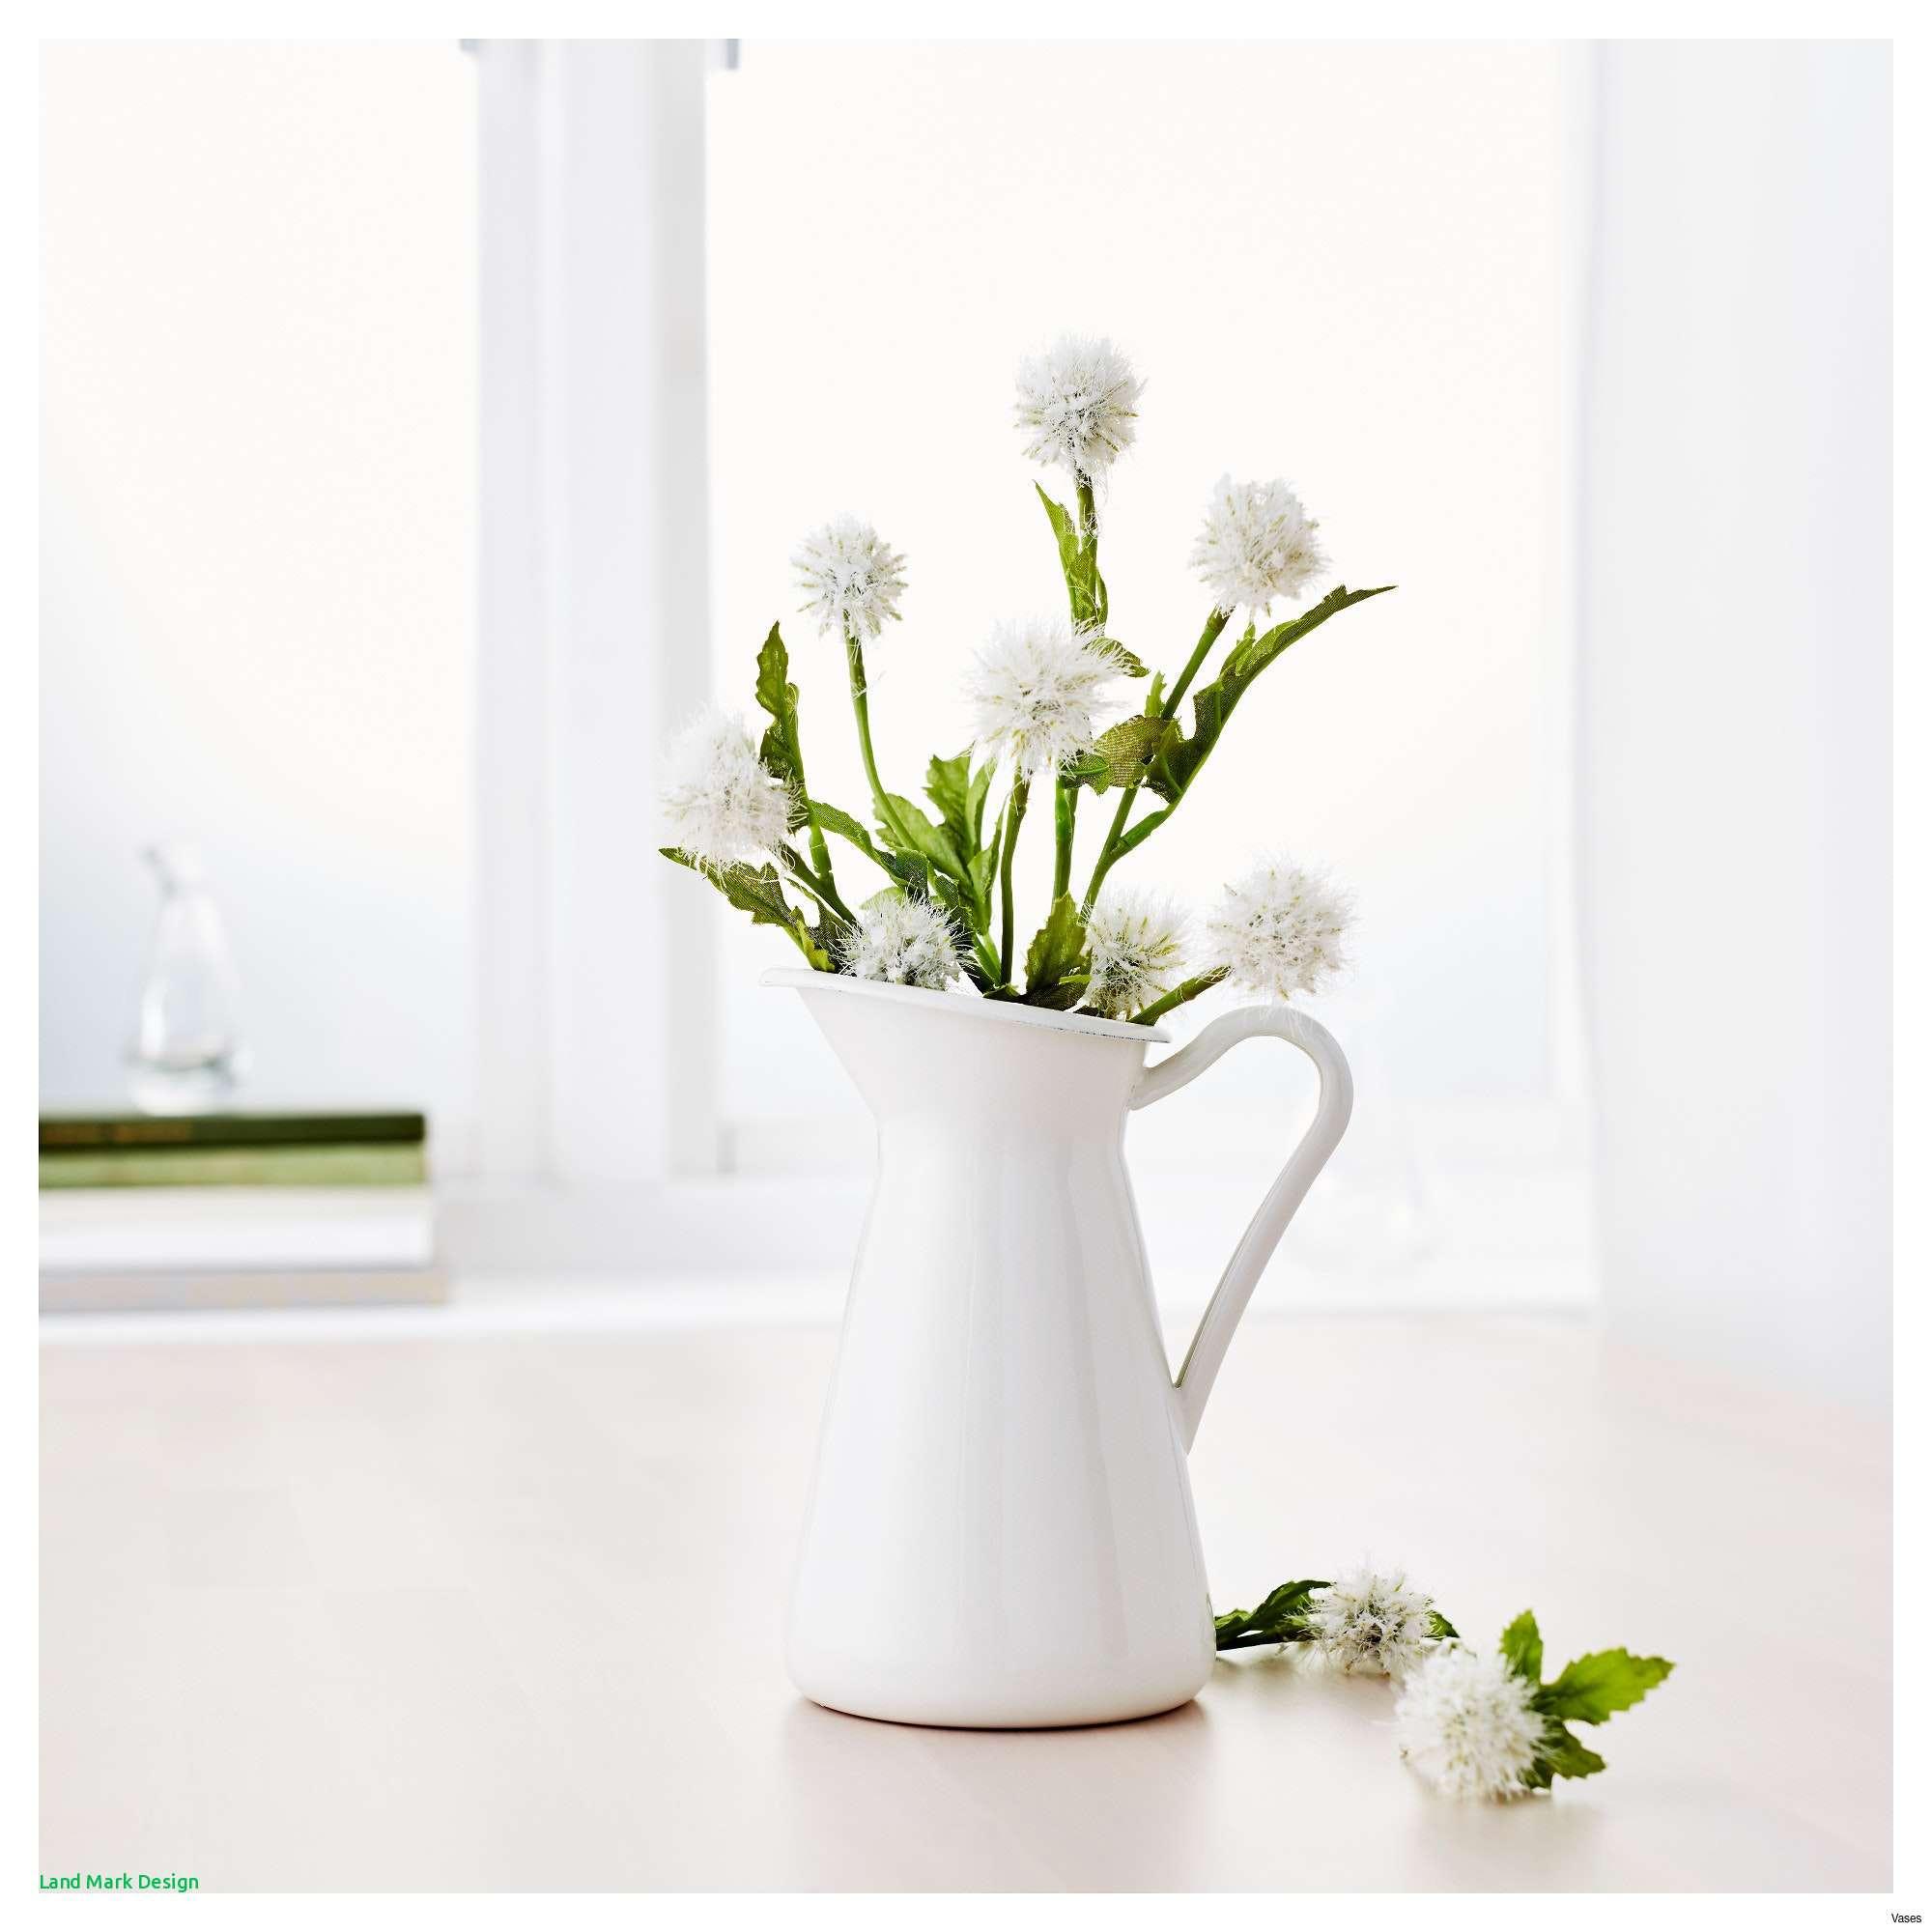 round vases ikea of large flower vase design home design inside 0429885 pe584248 s5h vases ikea flower i 0d